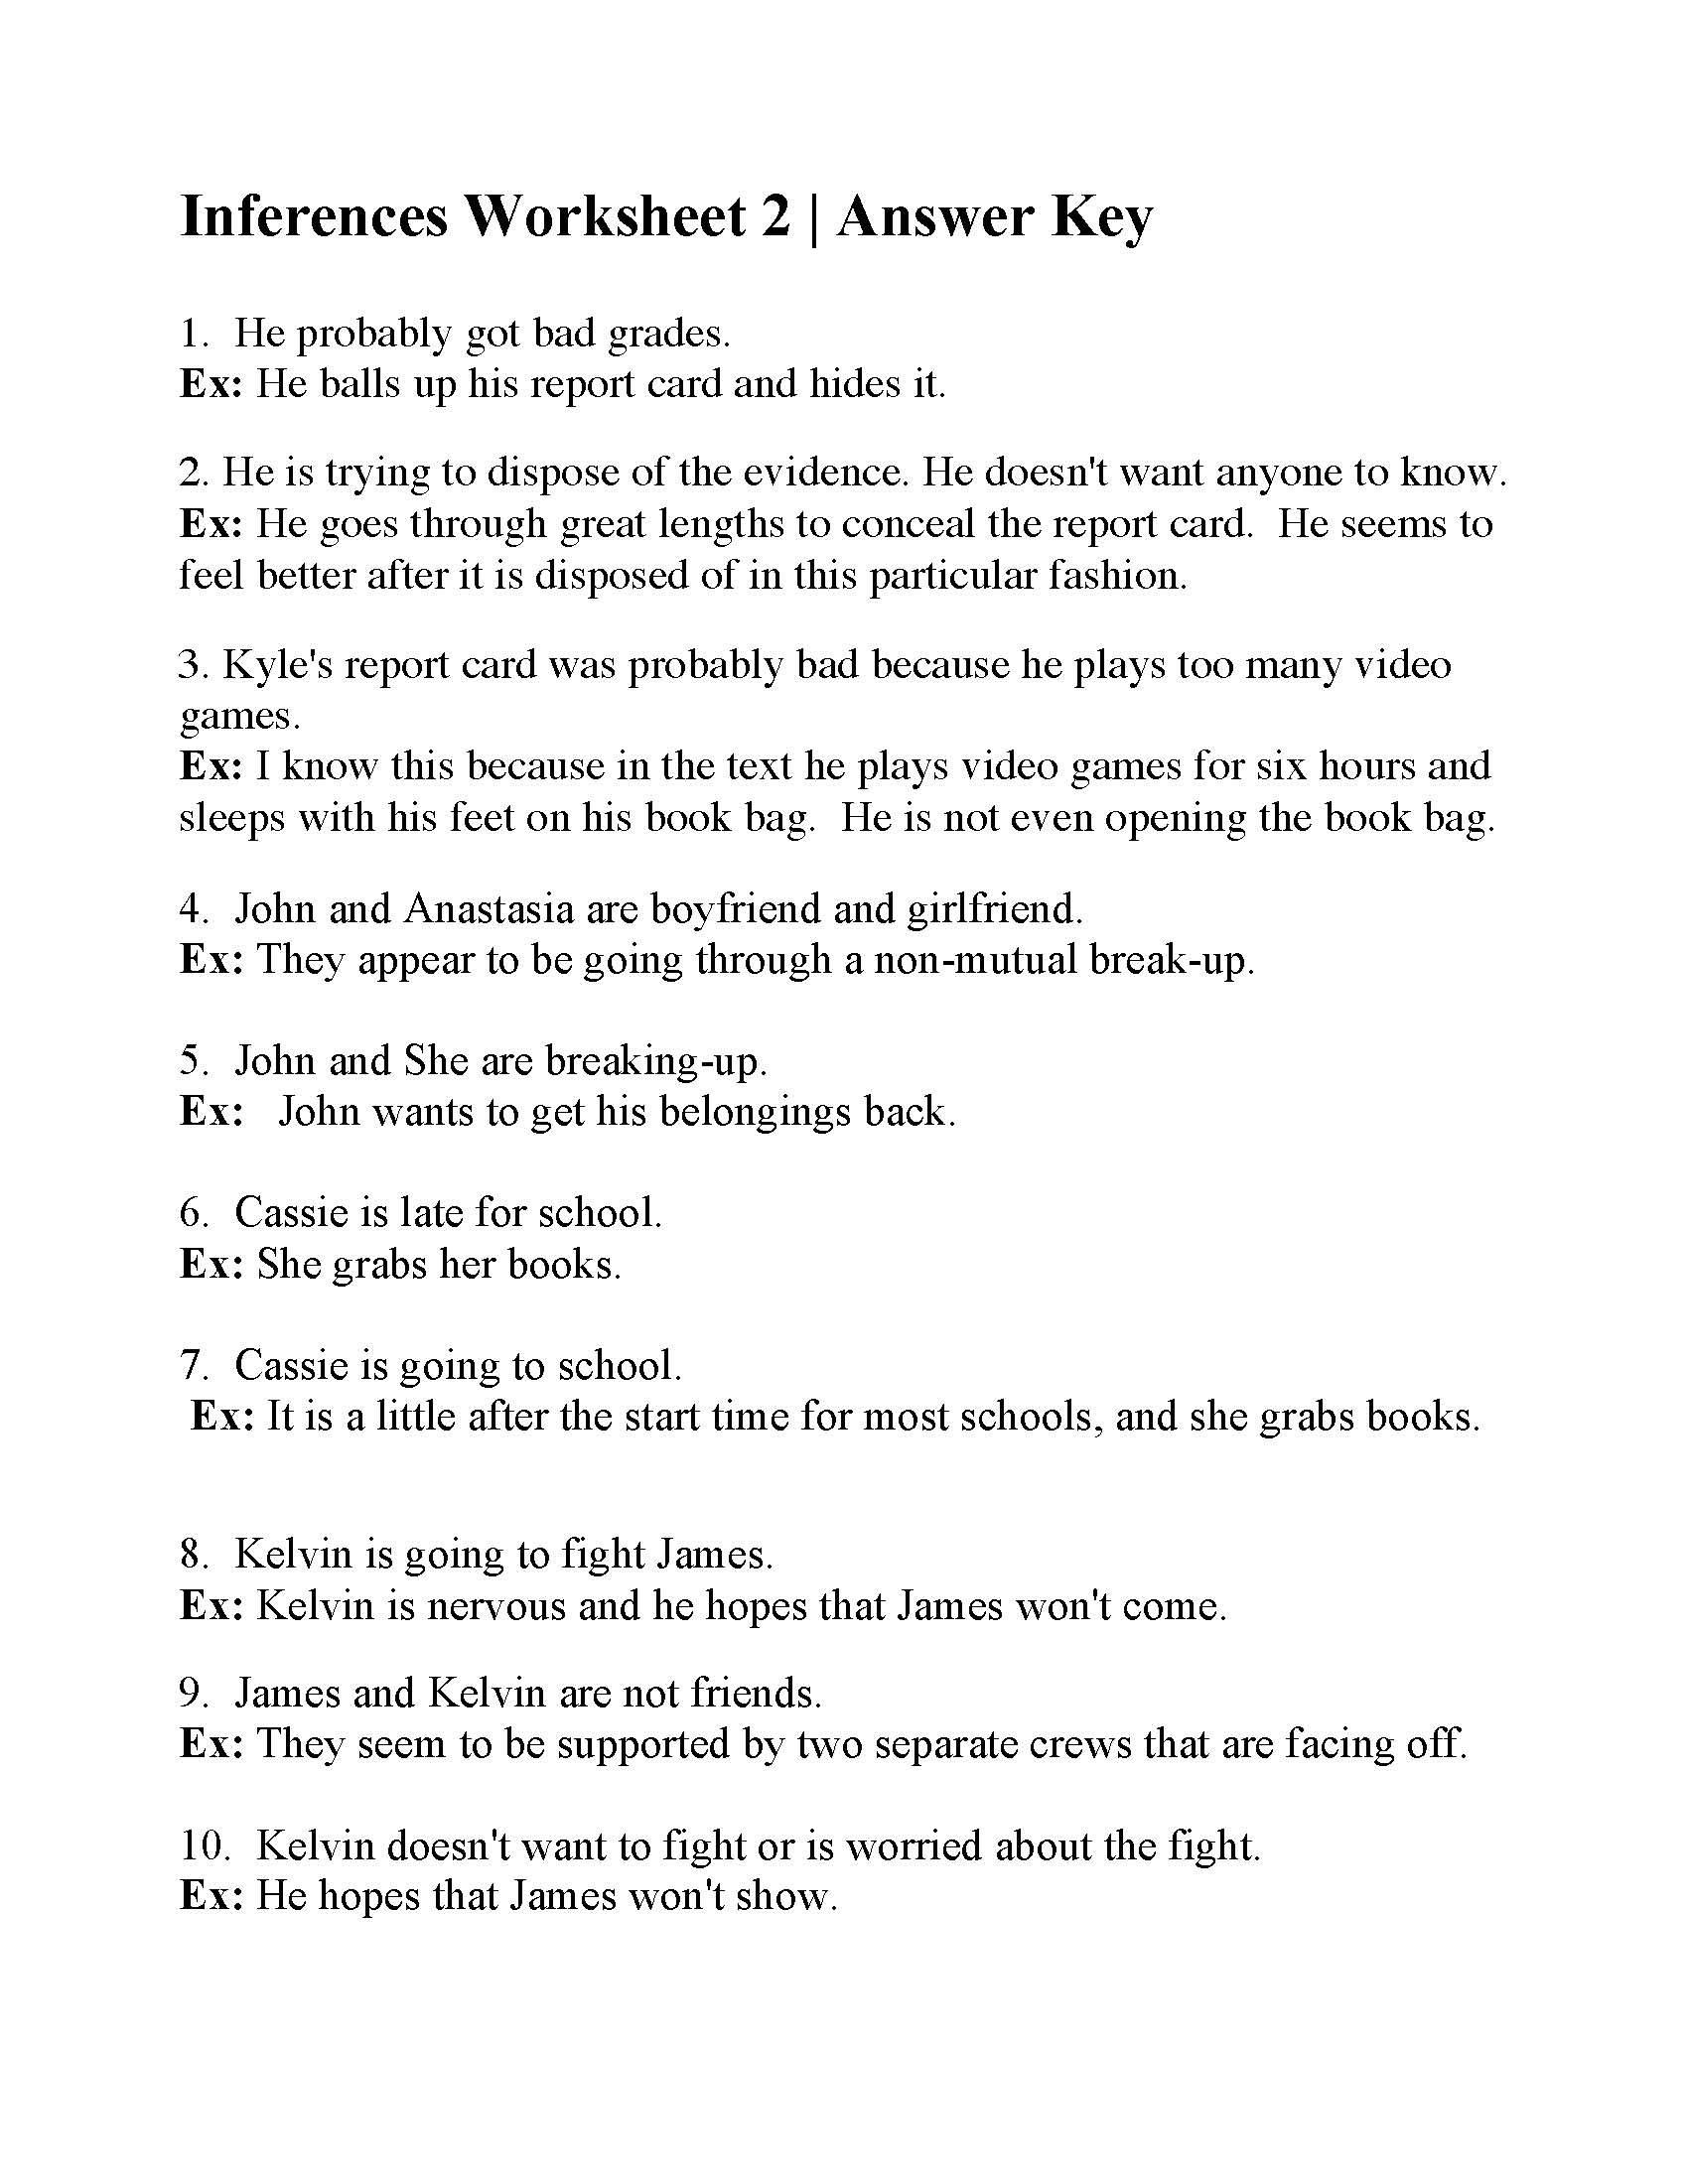 Inferencing Worksheets 4th Grade Inferences Worksheet 2